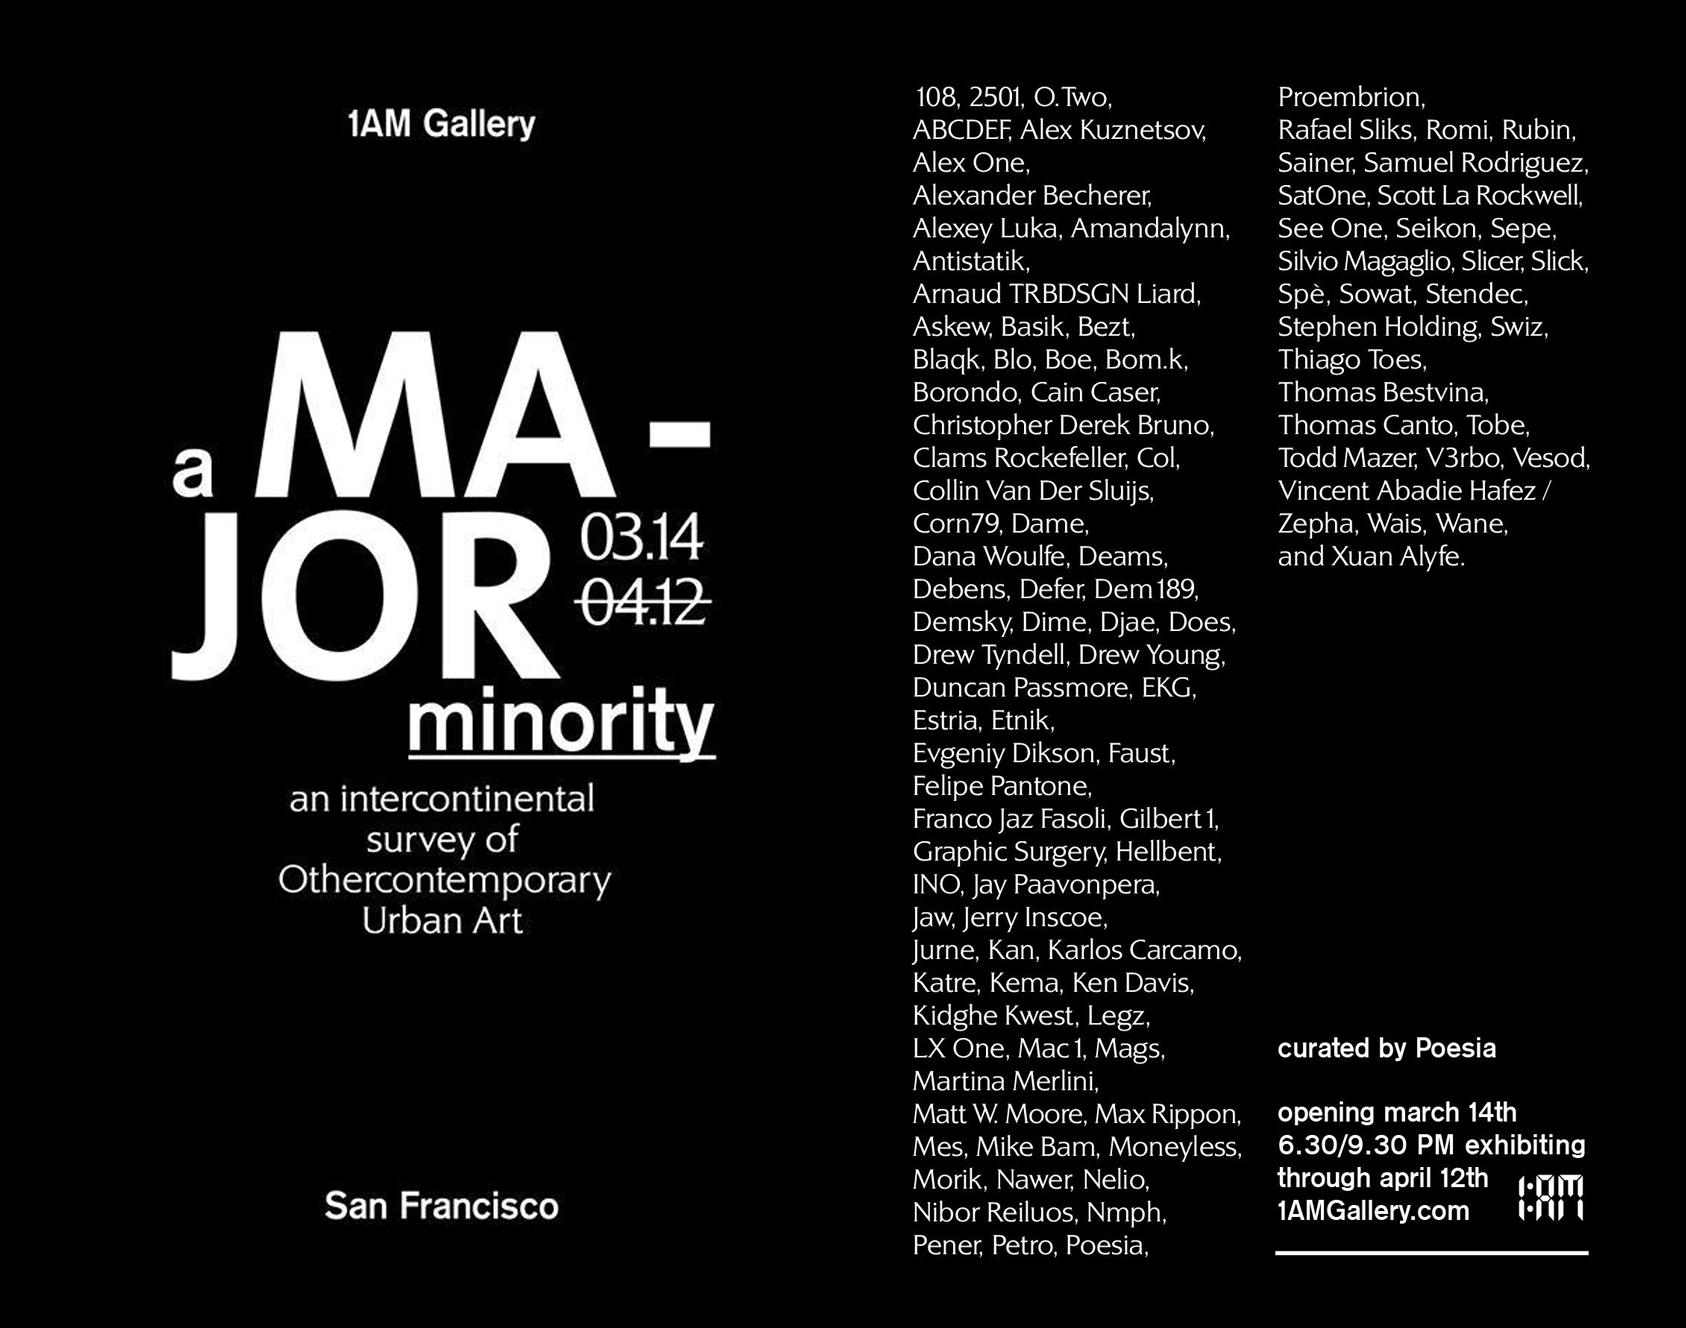 major minority